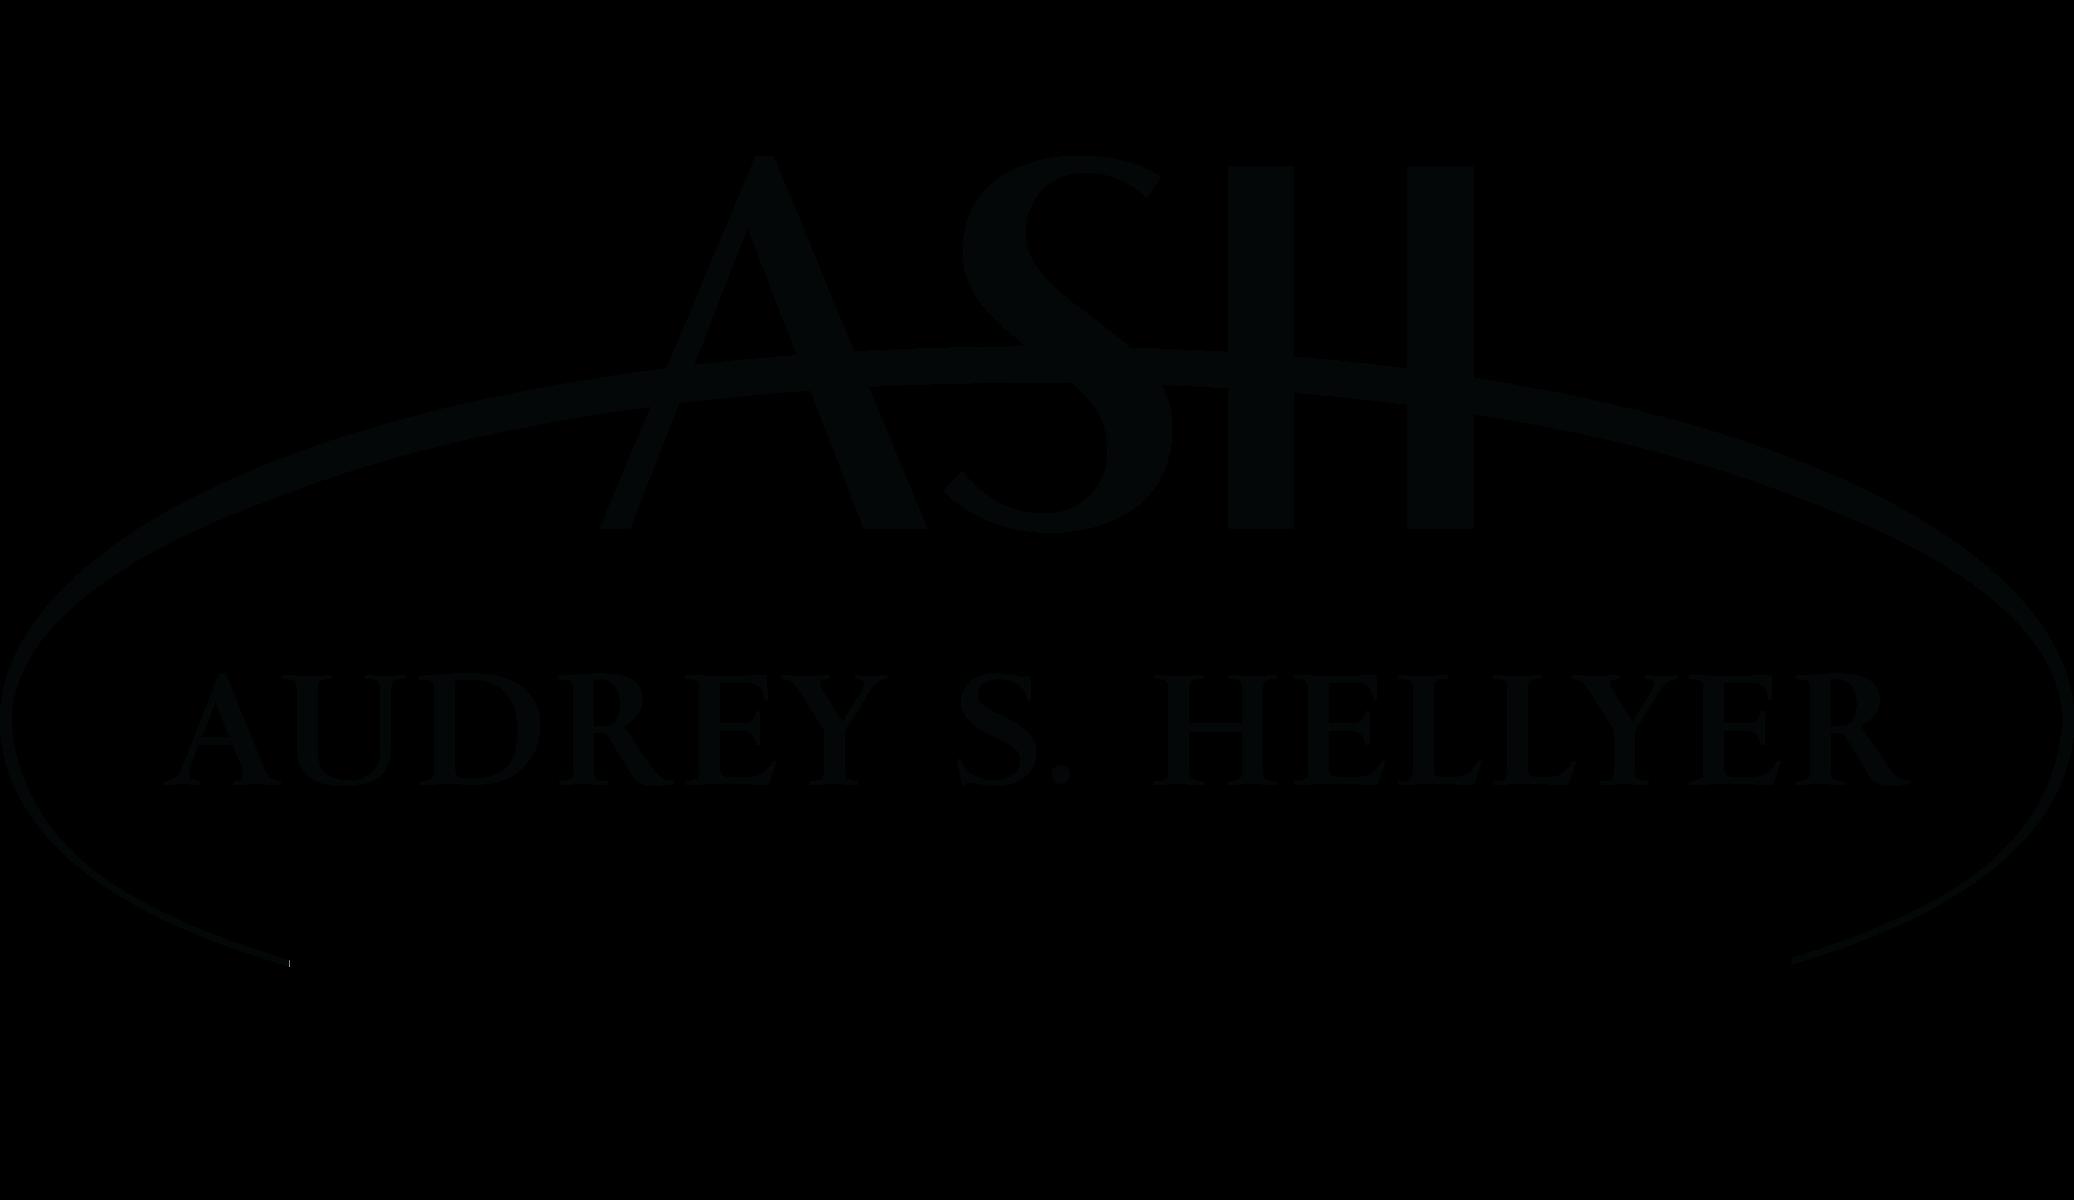 Audrey S. Hellyer Charitable Foundation